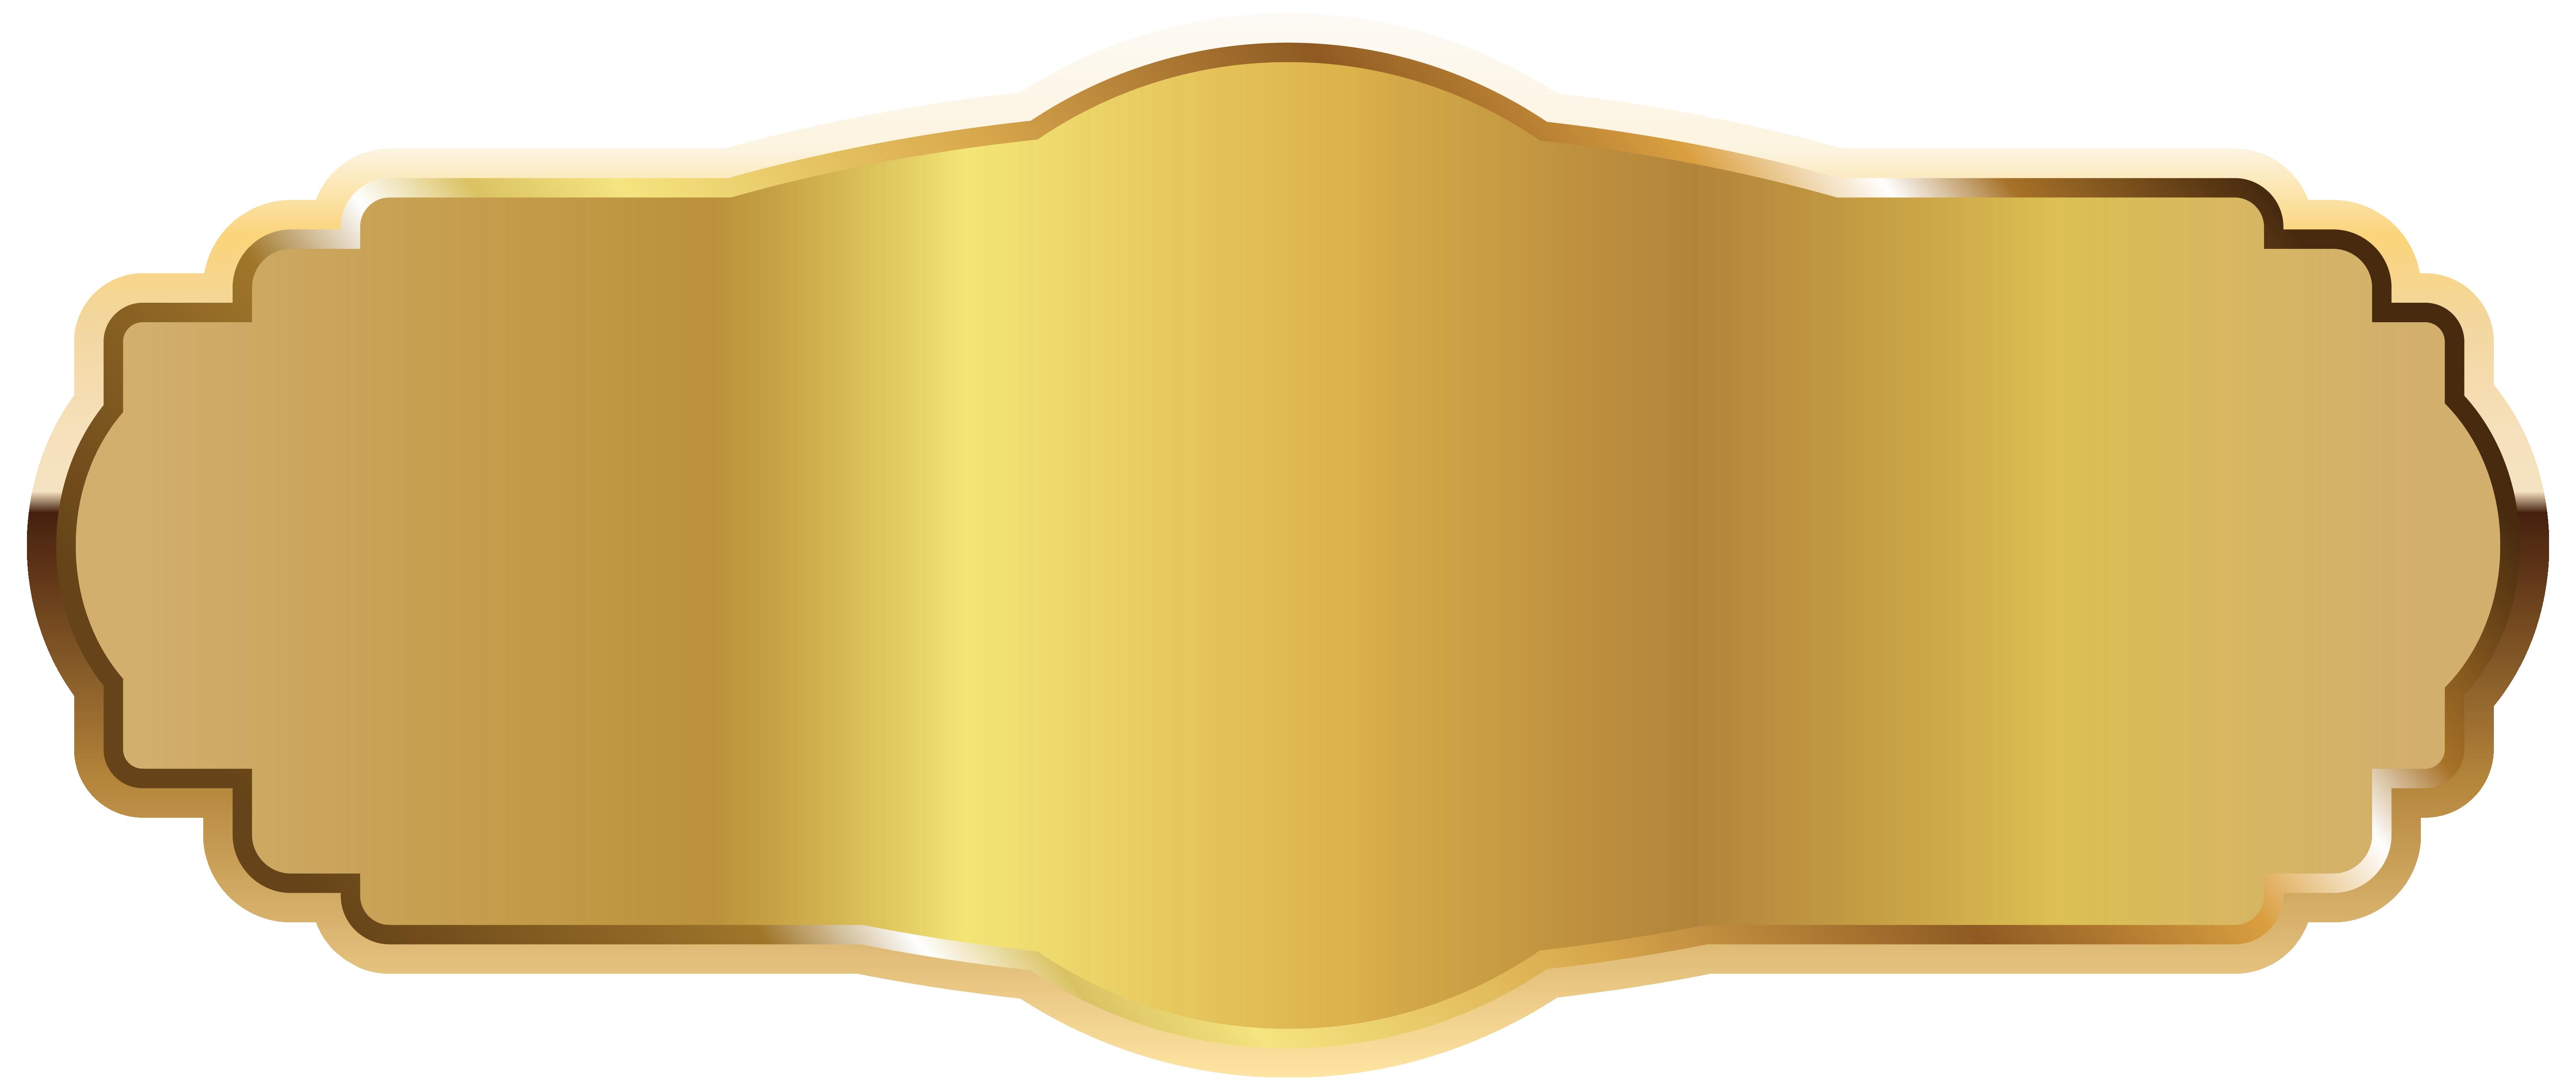 Gold Label PNG Clipart Image Gold labels, Clip art